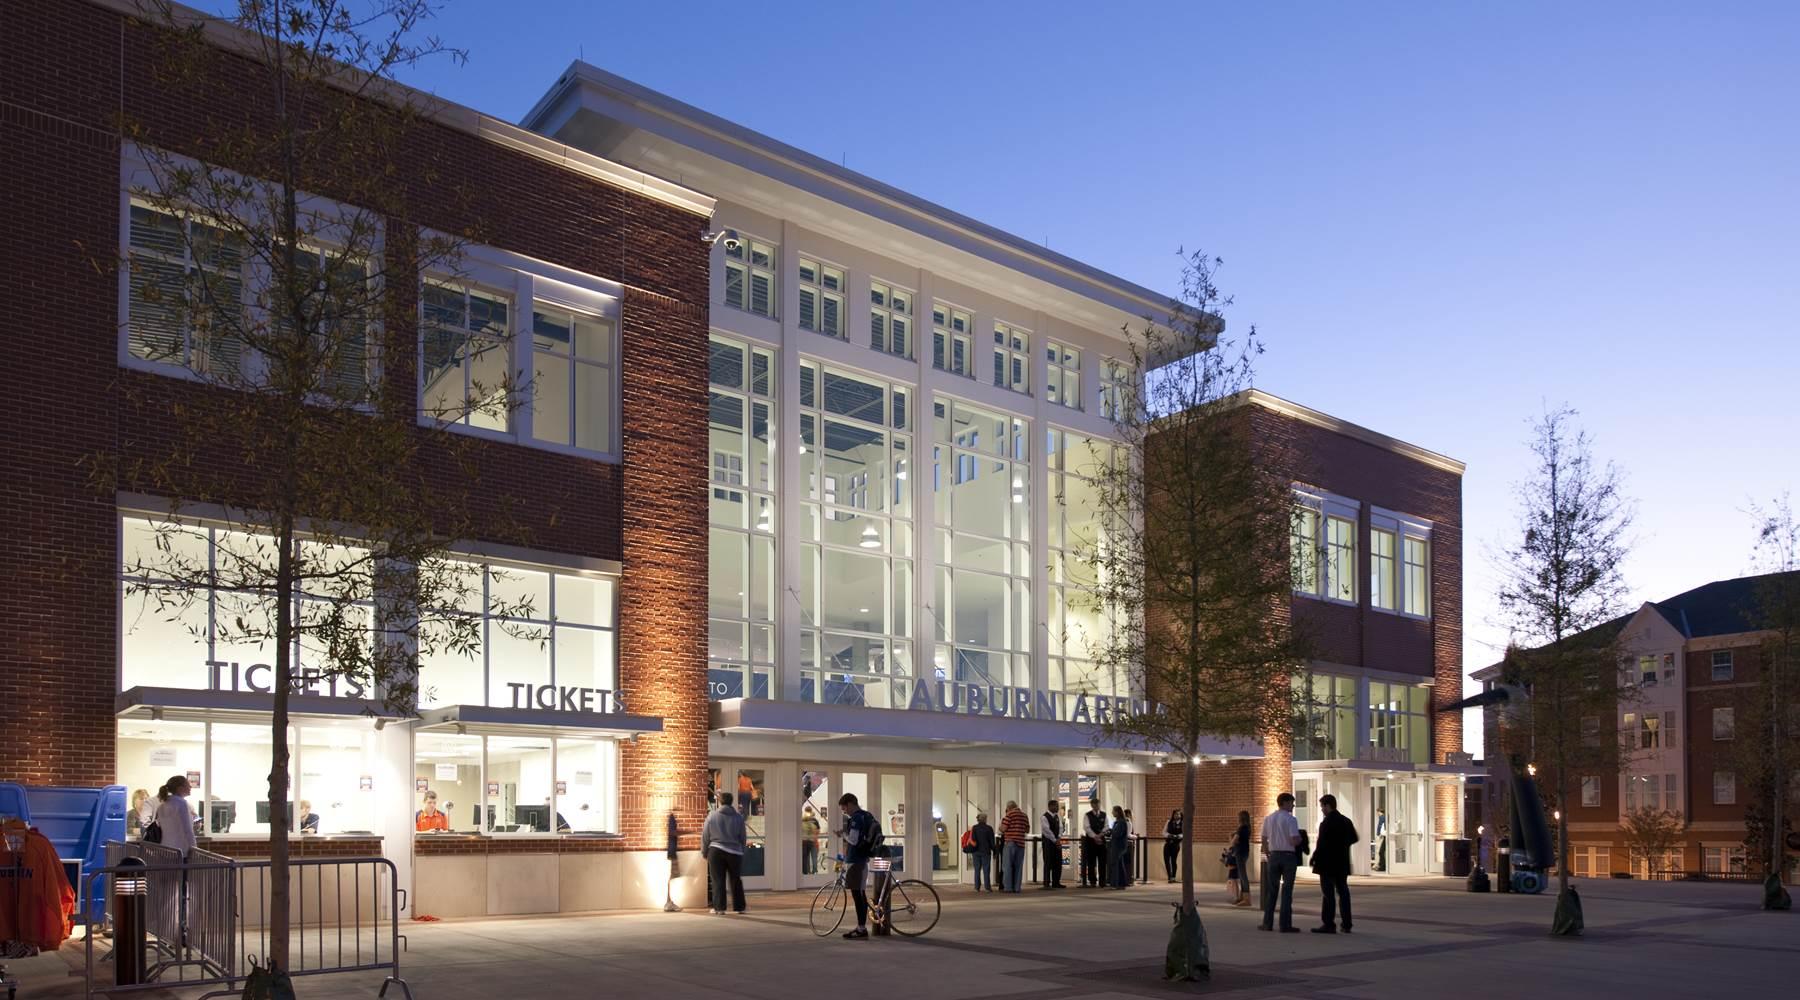 Auburn Arena at night